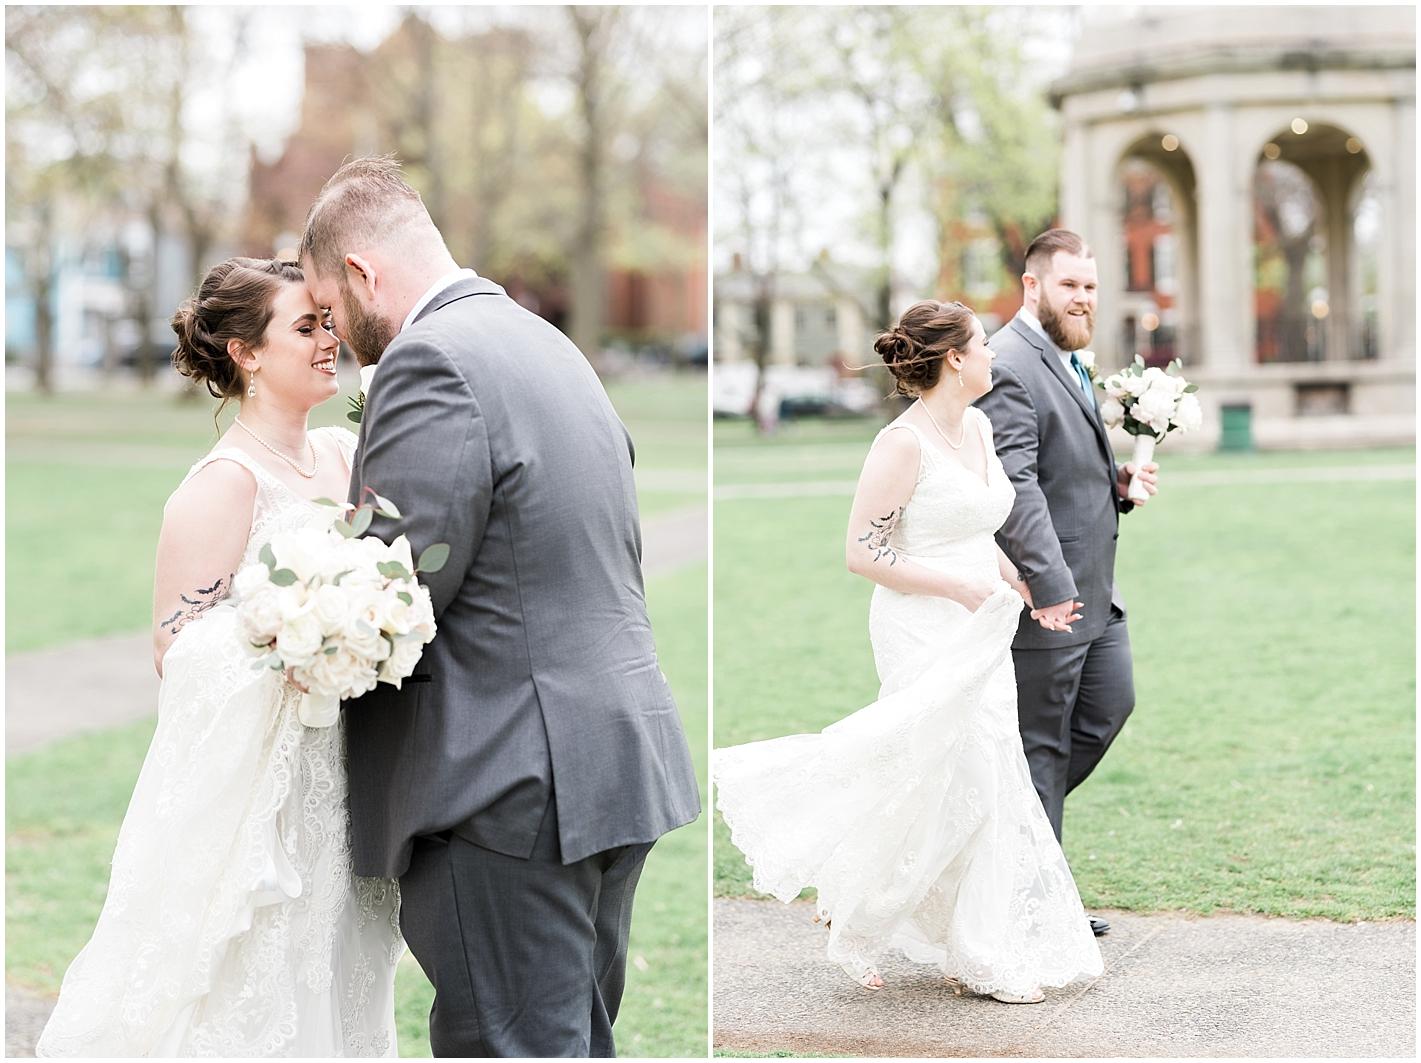 Salem MA Wedding Photos By Alyssa Parker Photography